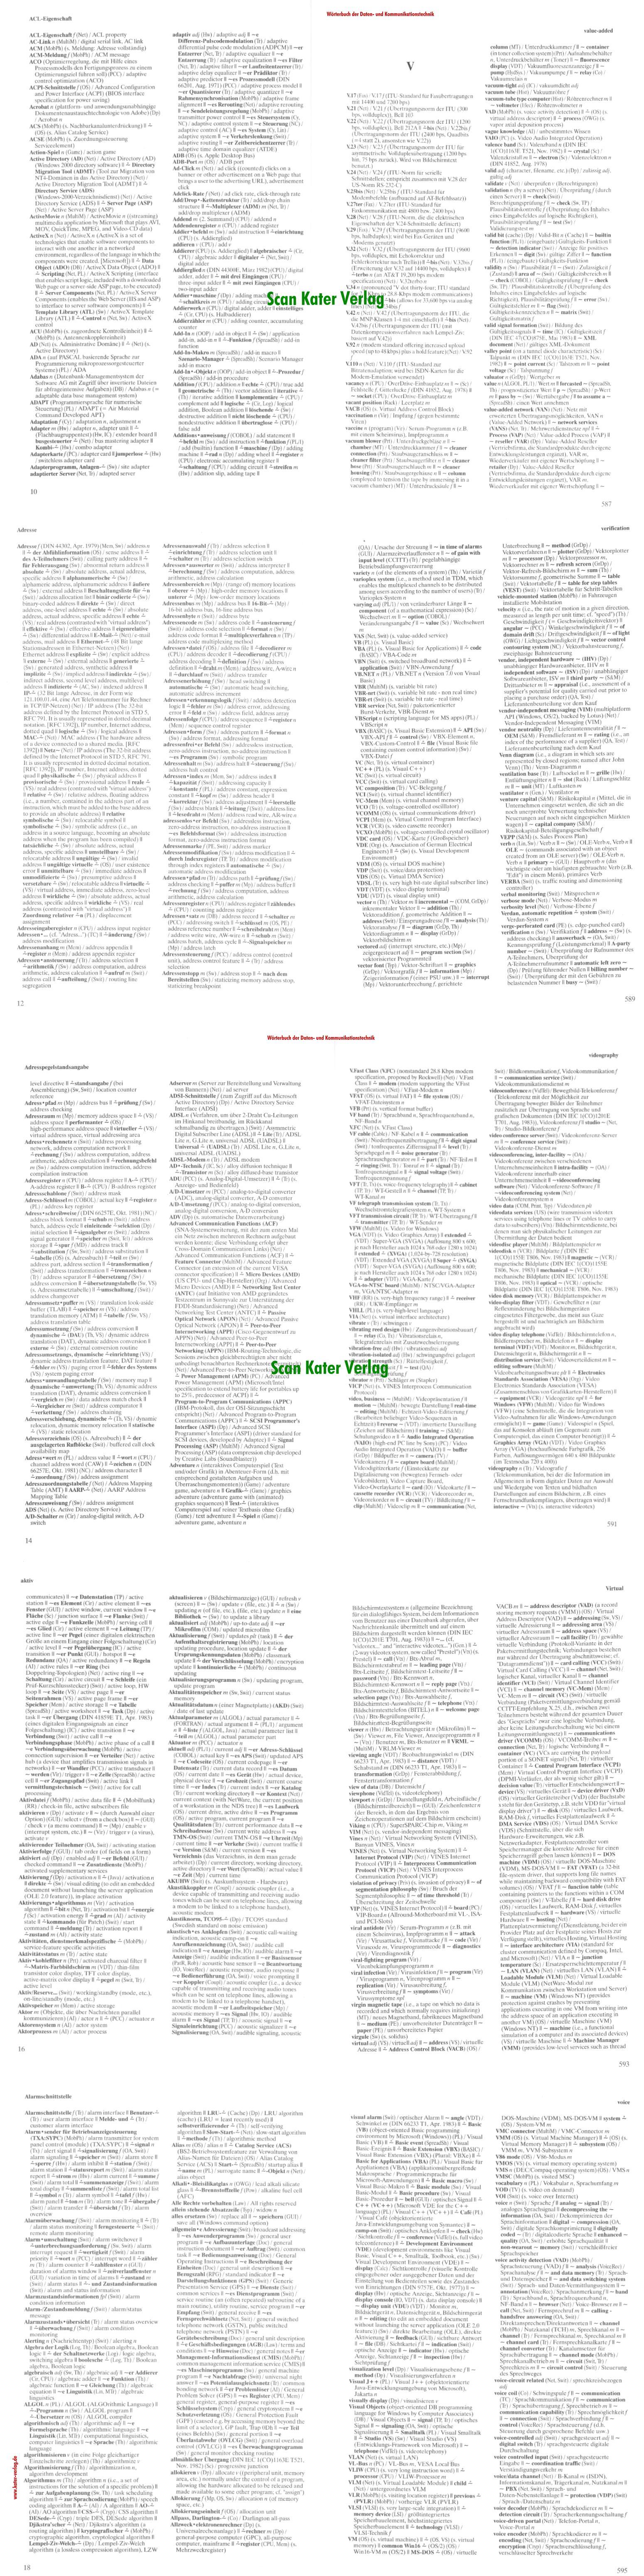 Brinkmann / Blaha: Wörterbuch der Daten- und Kommunikationstechnik DE-EN, EN-DE